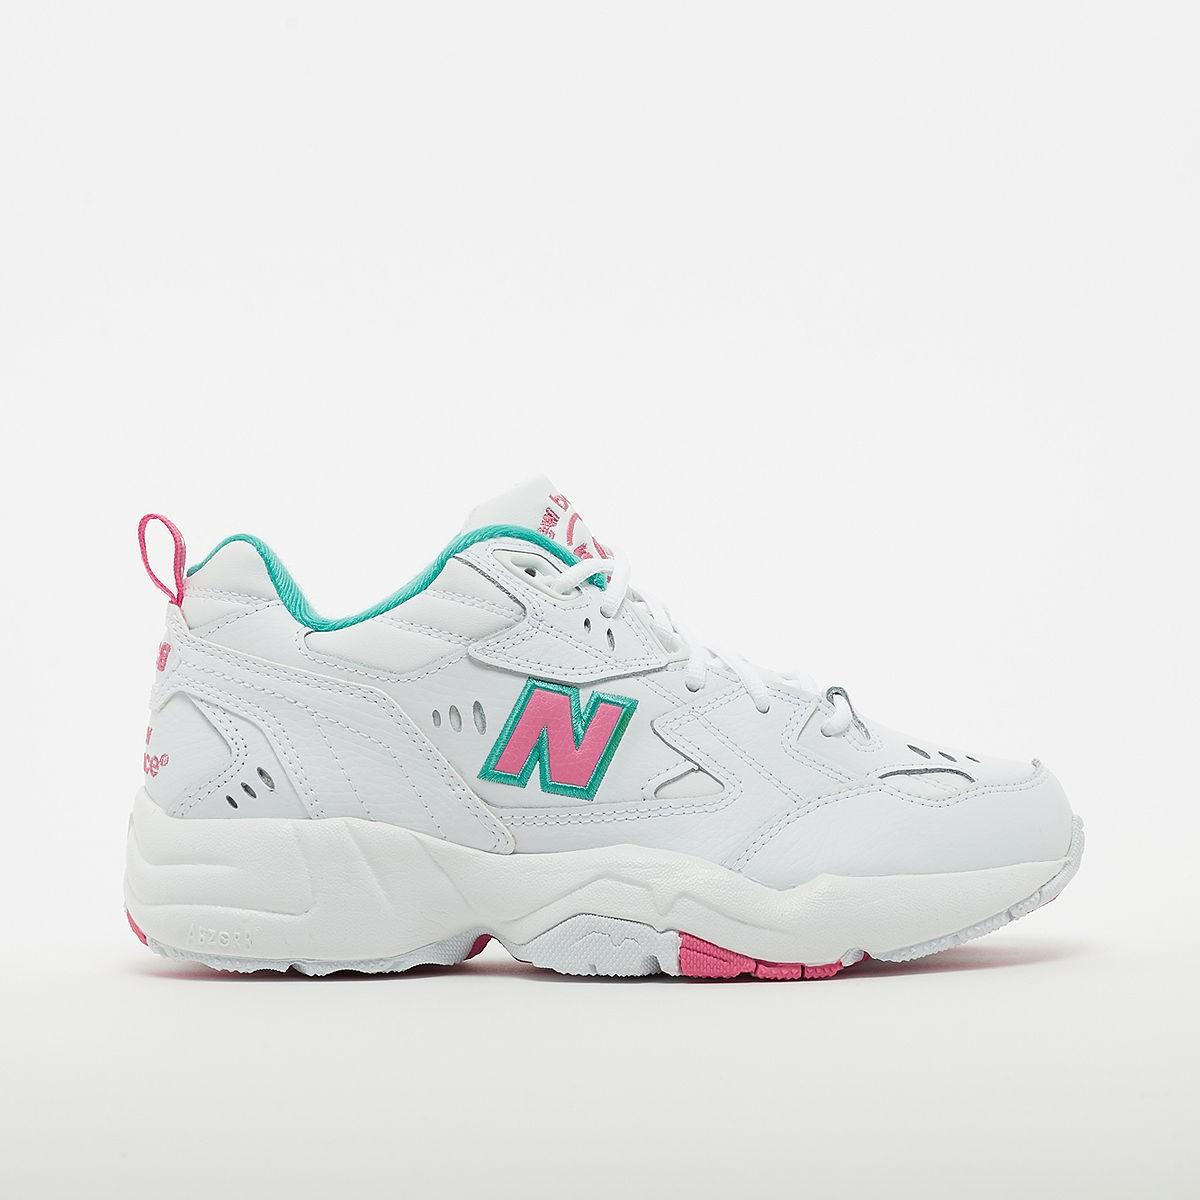 New Balance 608 WT1 Sneakers women white pink